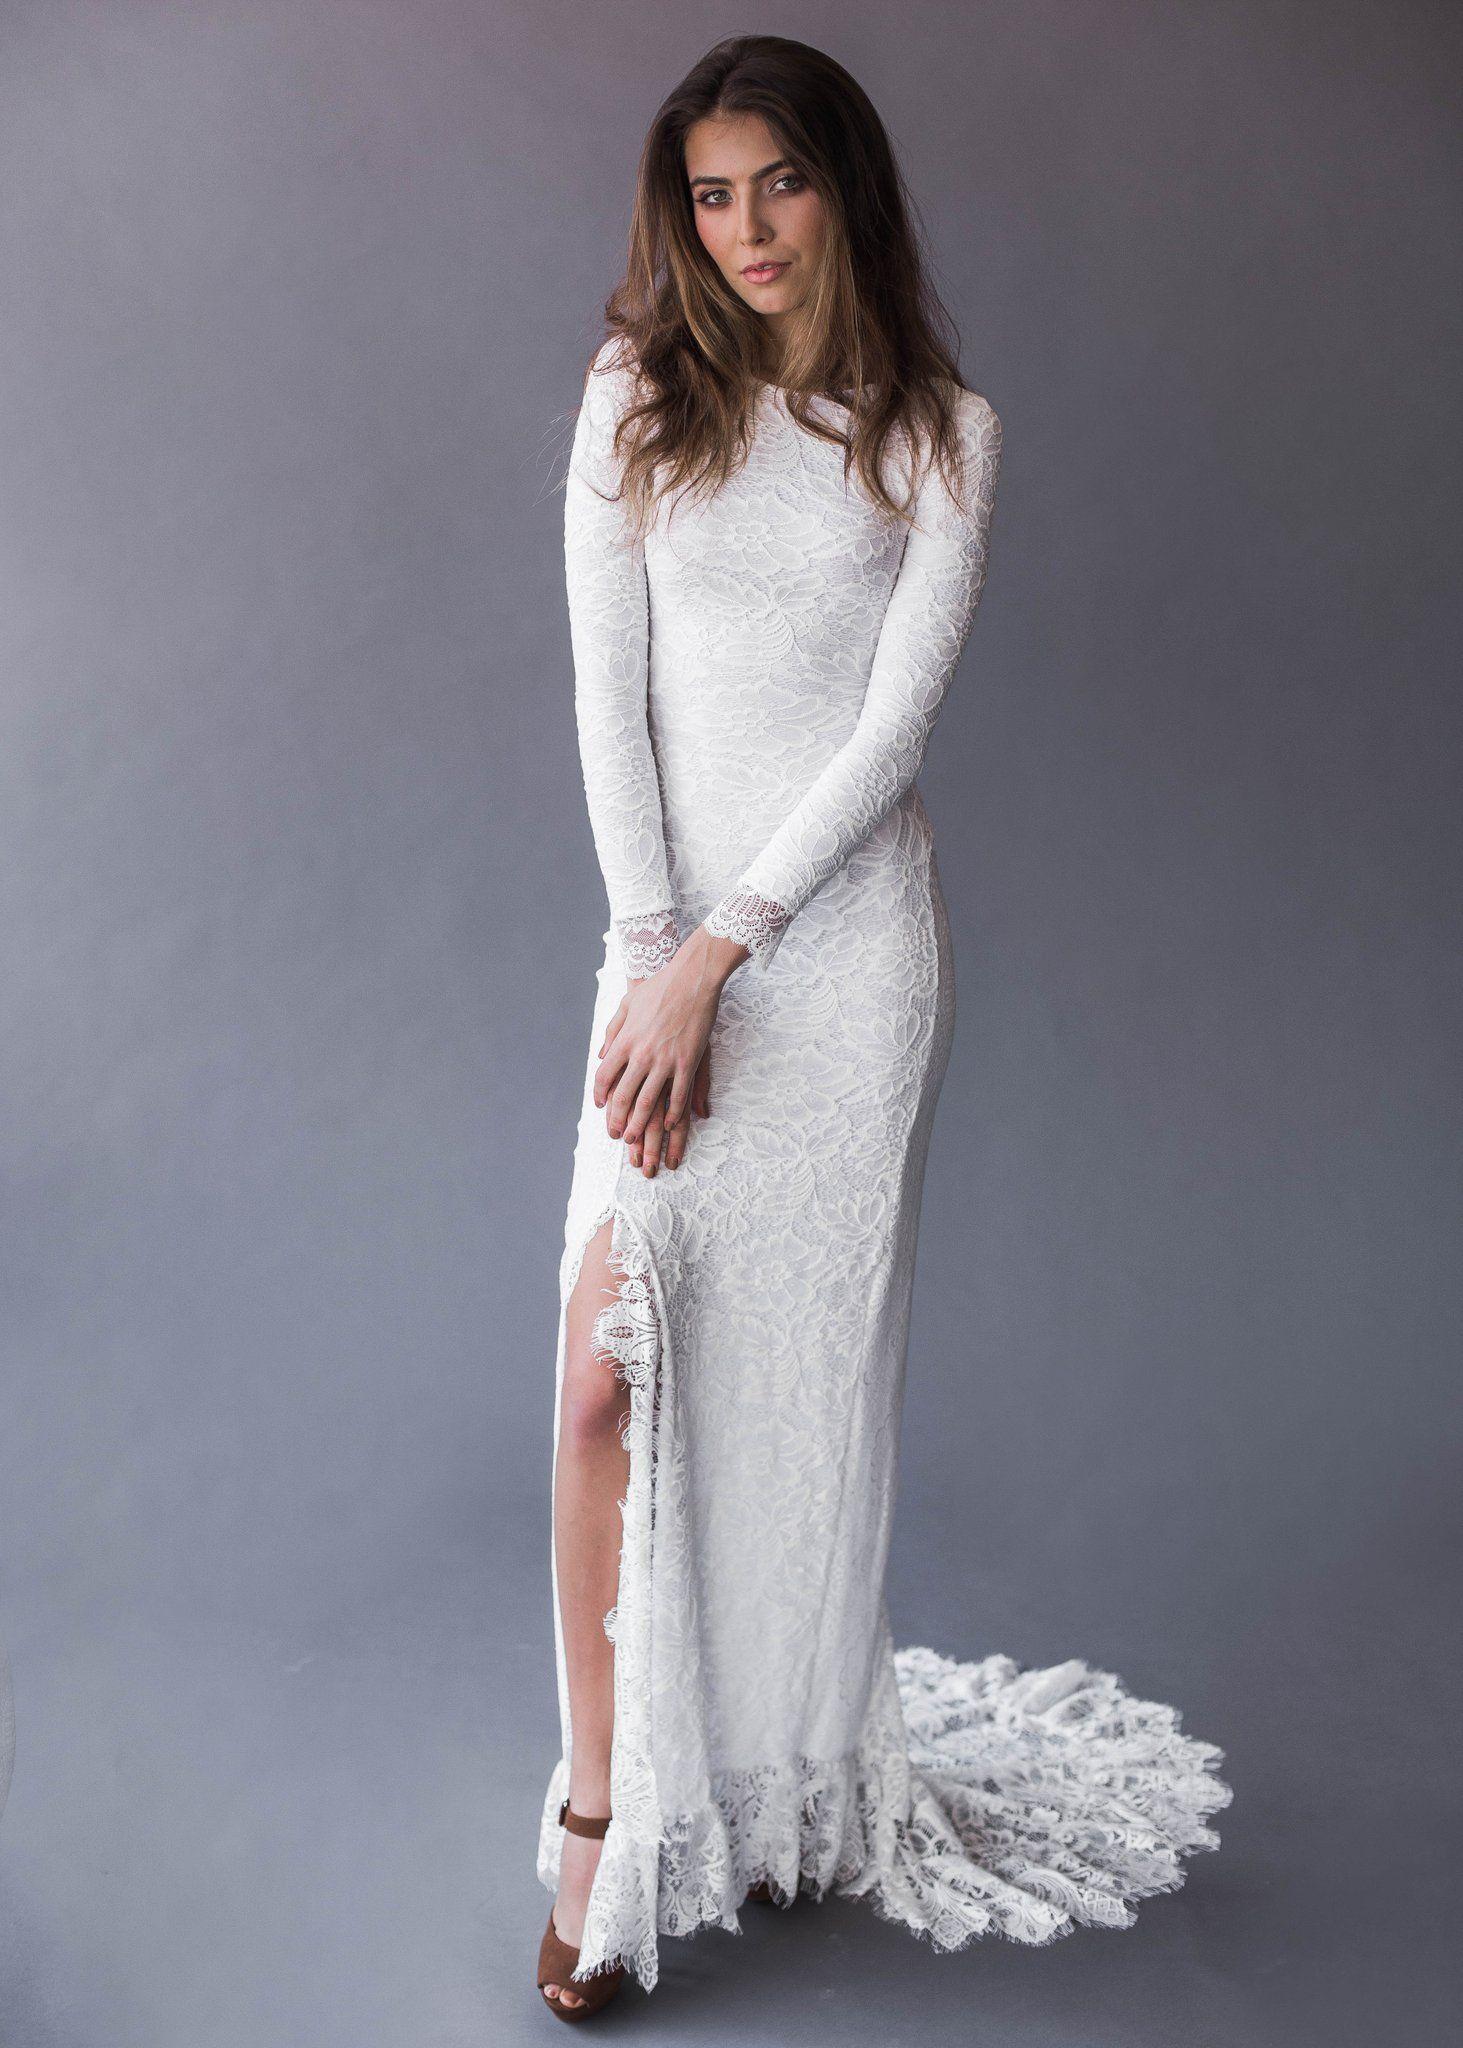 Grey lace wedding dress  Madelyn  Dress  Indie wedding dress Wedding dress bohemian and